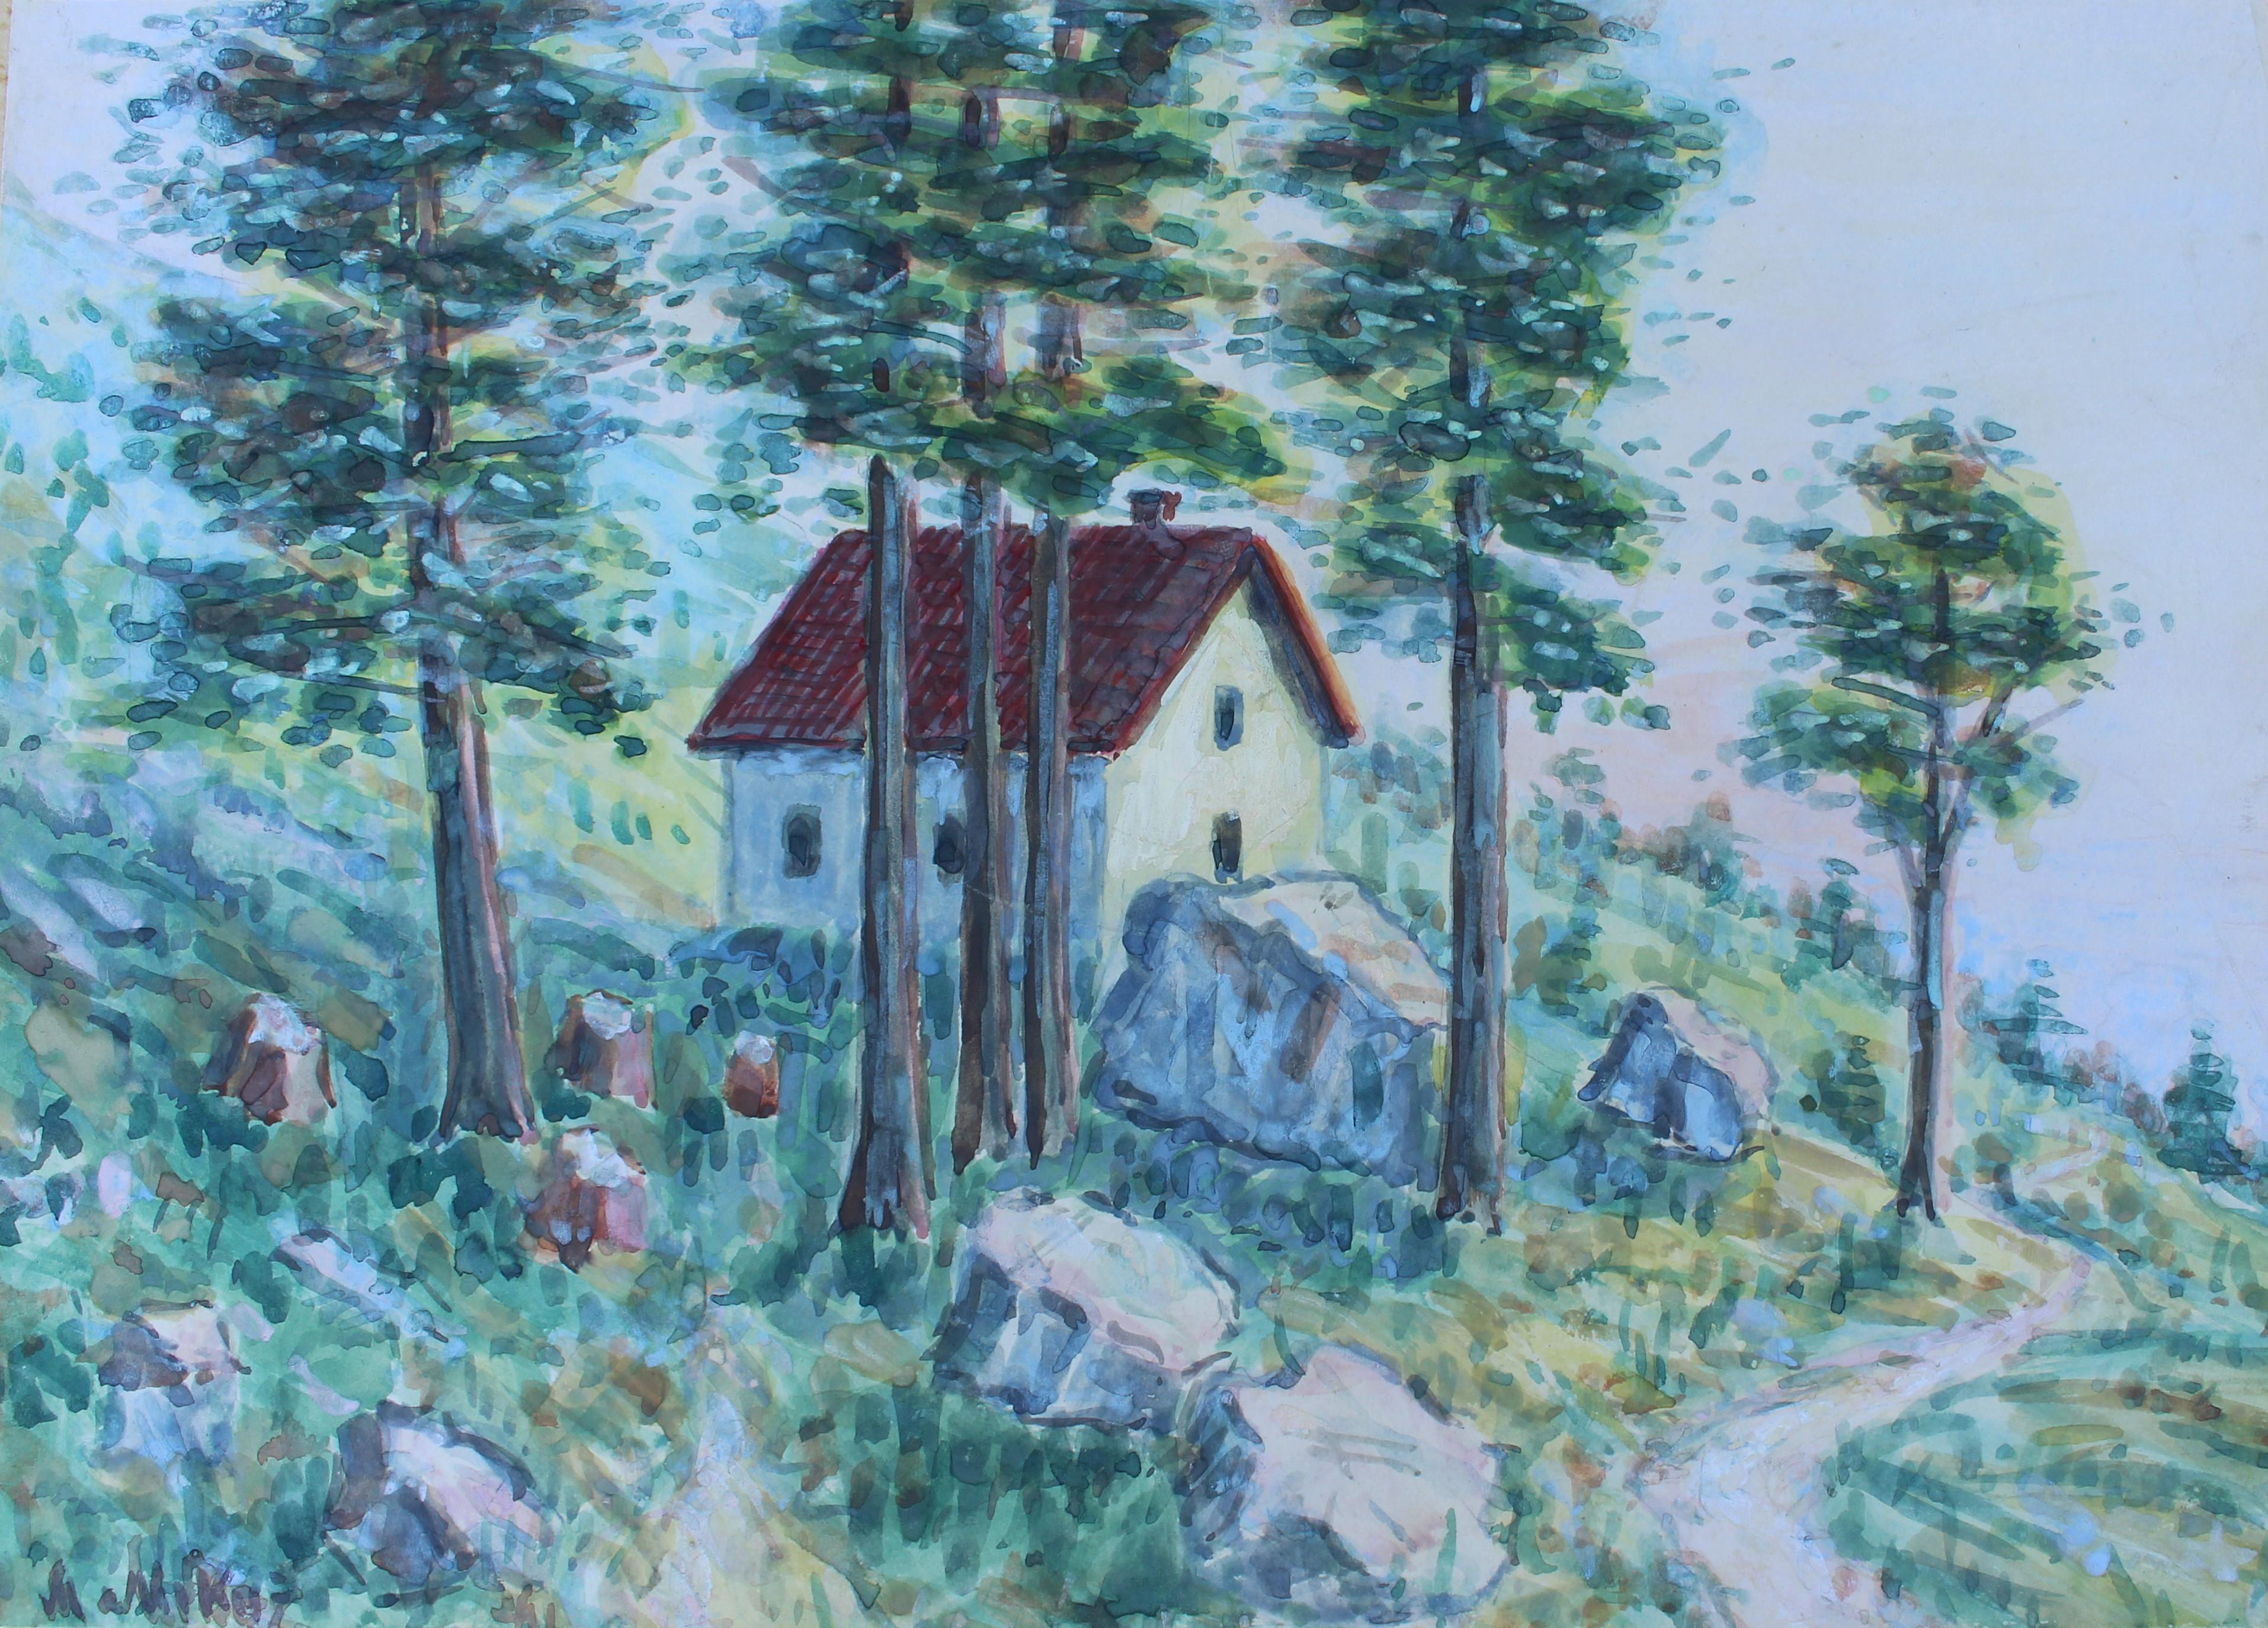 koca_pl_razor_1948_milan_mikuz